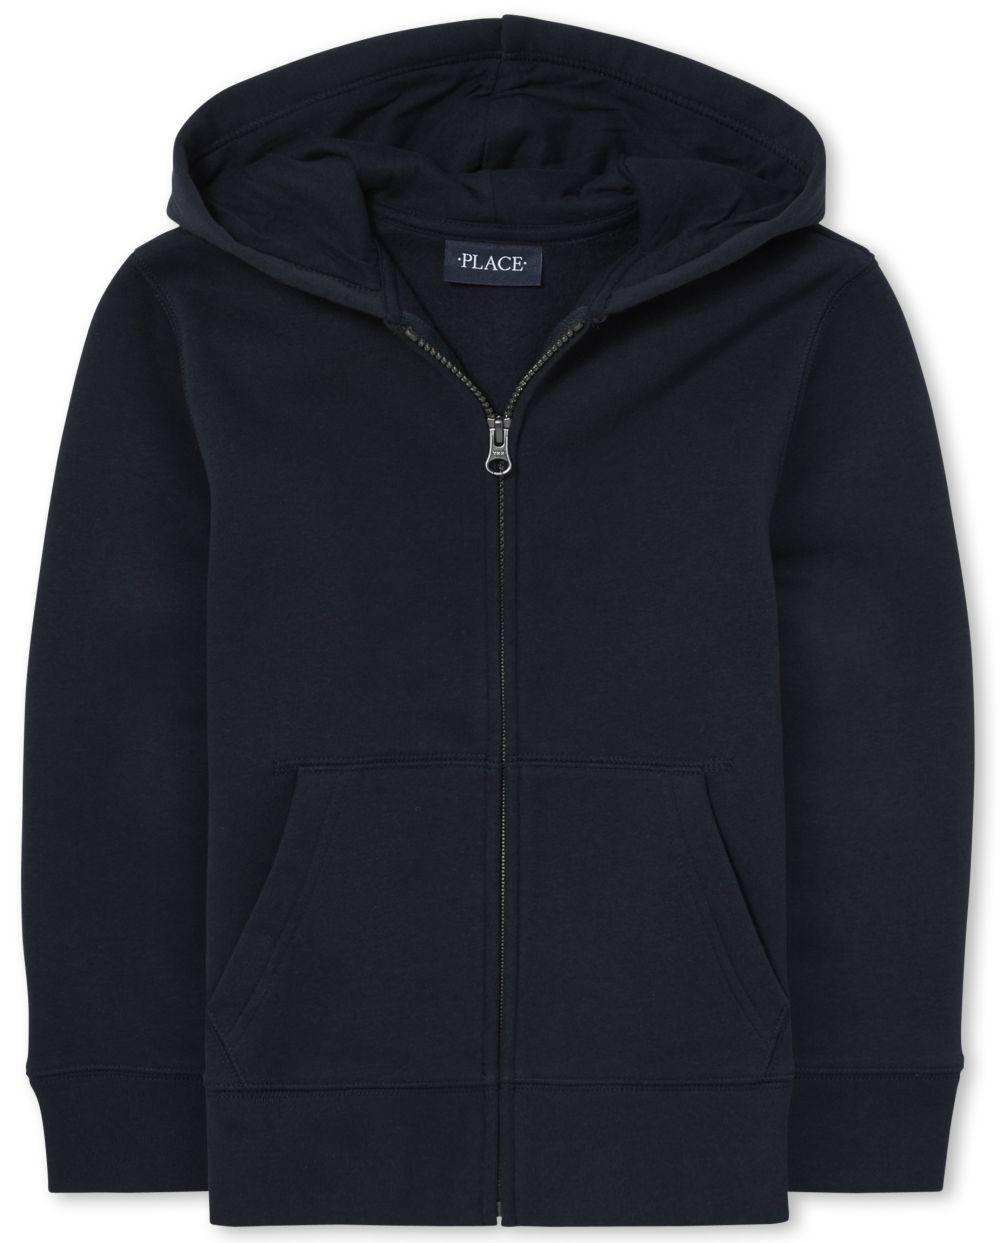 Boys Uniform Zip Up Hoodie